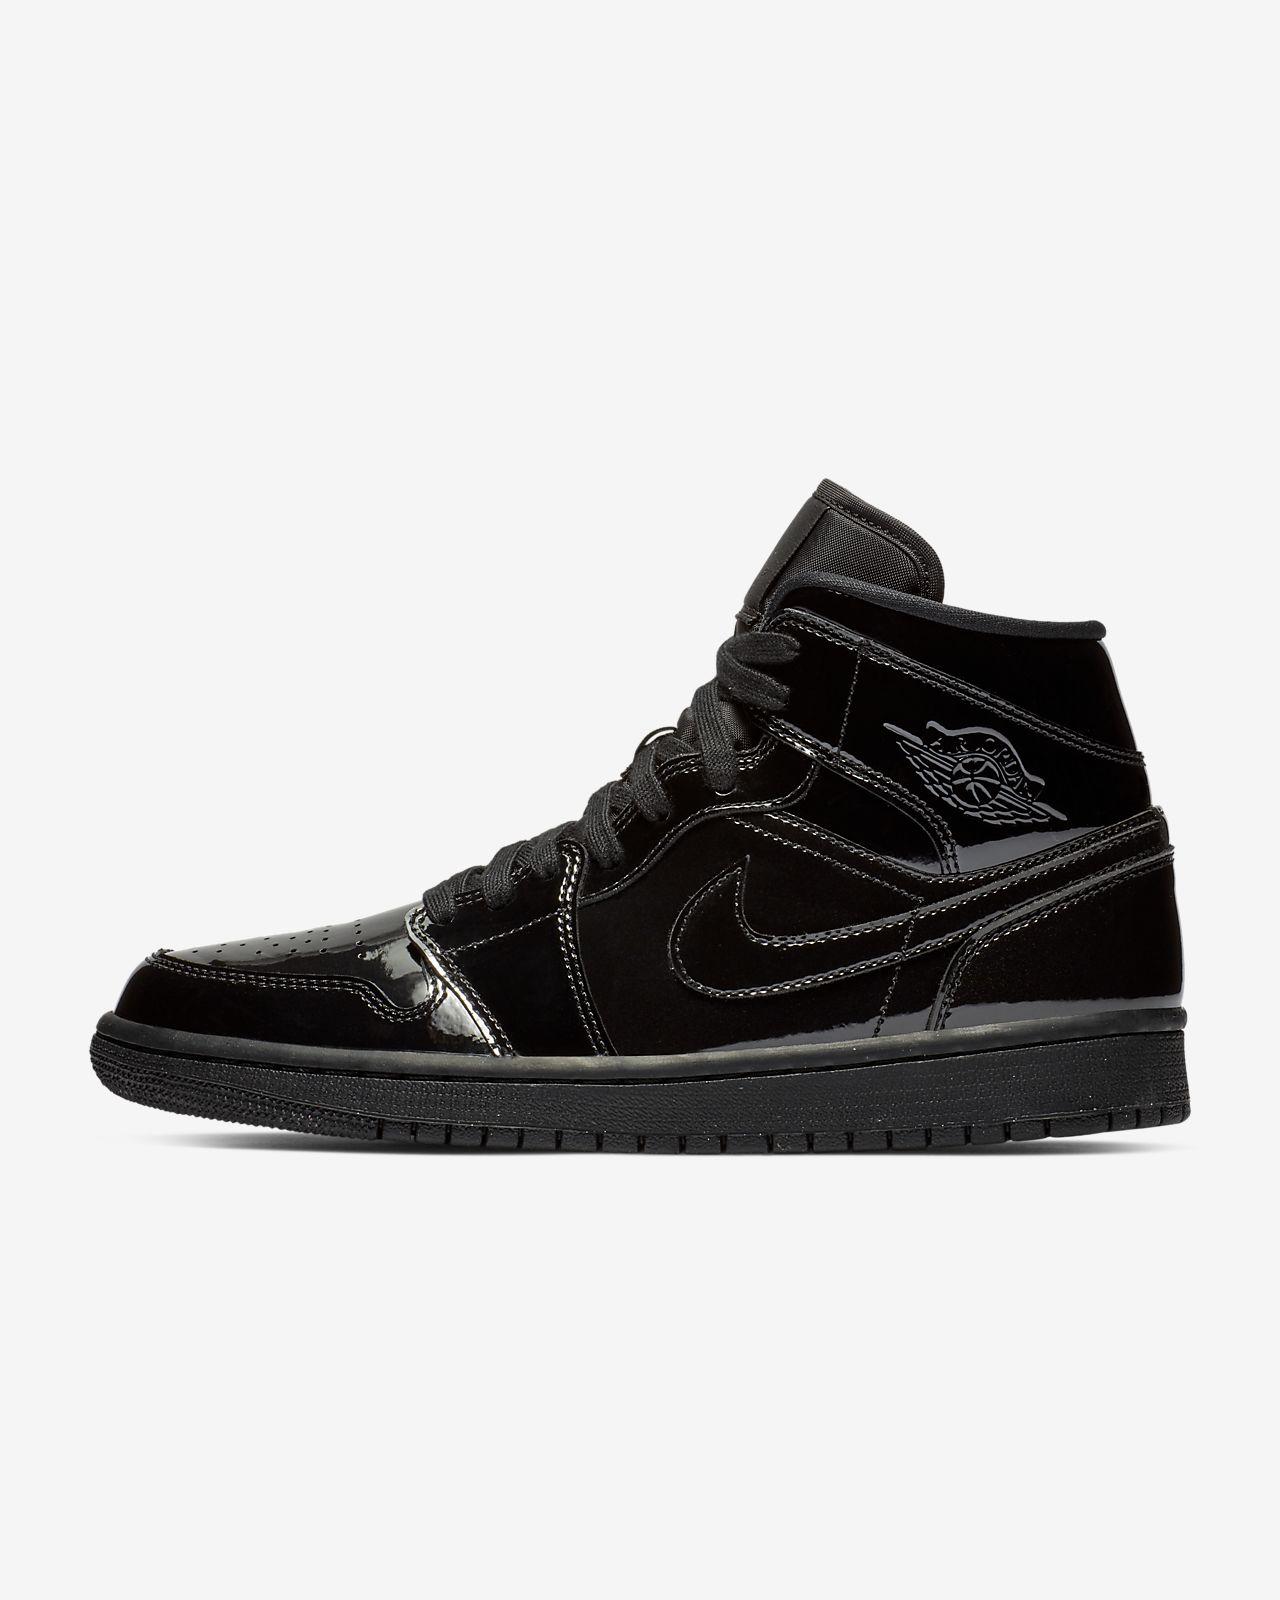 d0a2a09b99b Pánská bota Air Jordan 1 Mid. Nike.com CZ